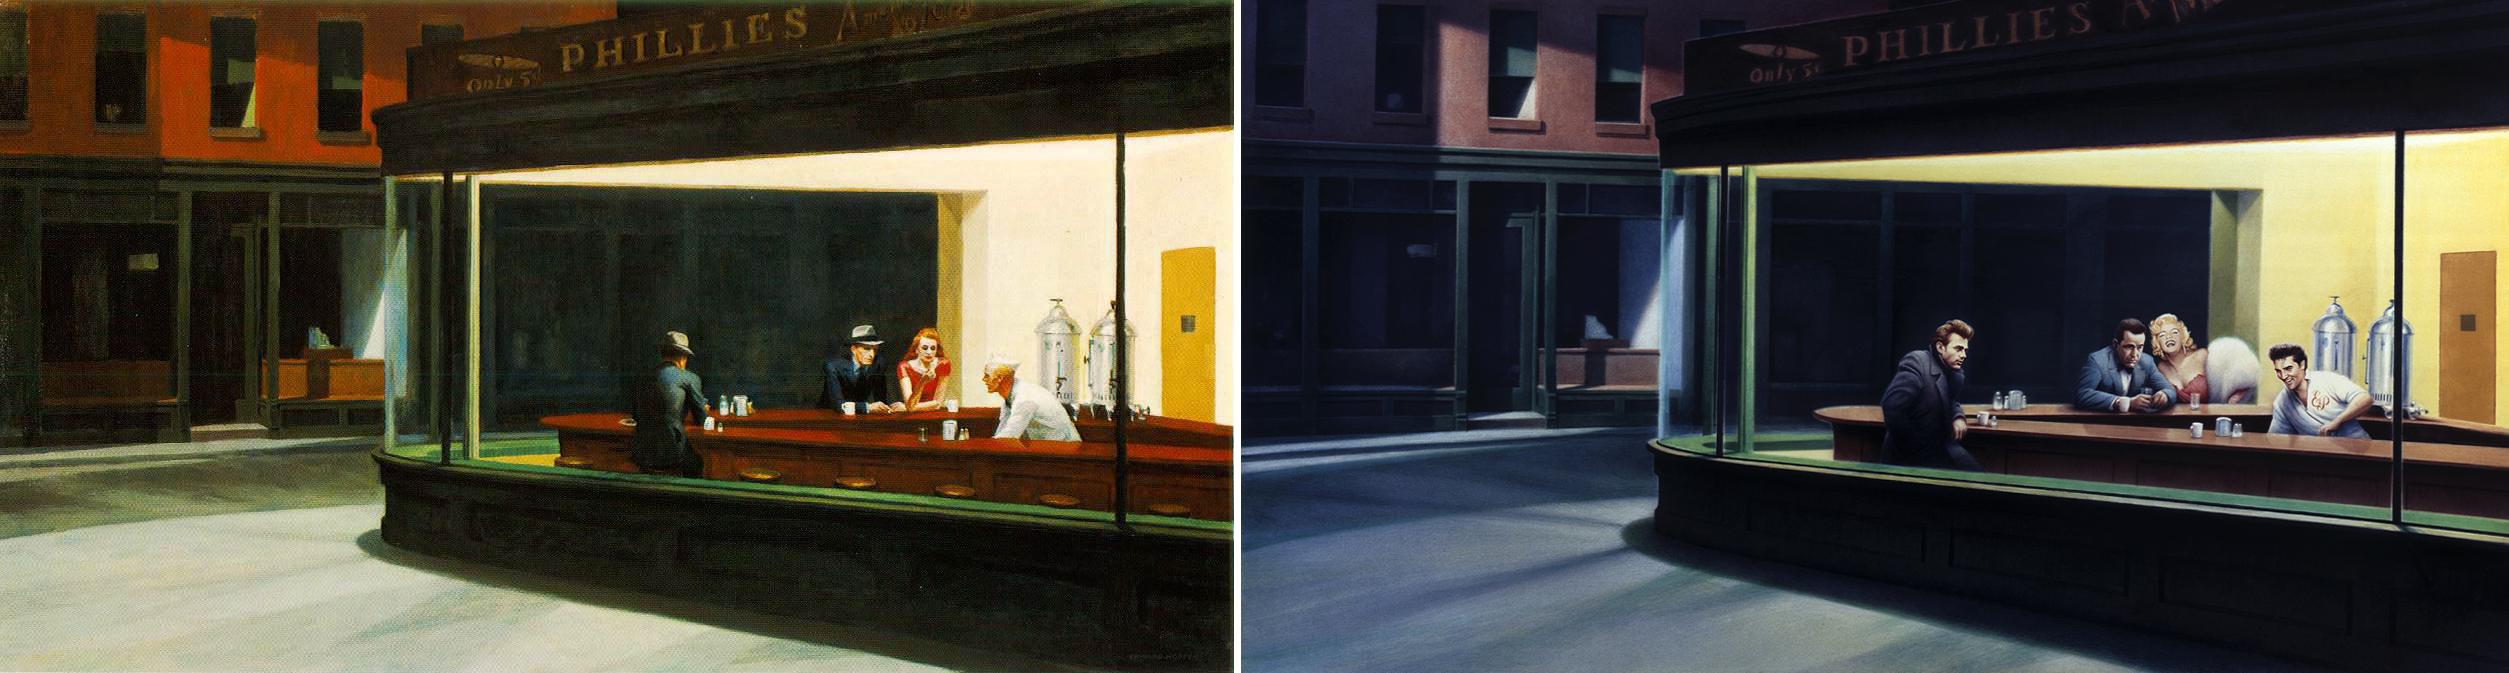 "Izquierda, ""Nighthawks"" (Edward Hopper, 1942). Derecha, ""Boulevard of Broken Dreams"" (Gottfried Helnwein, 1987)"